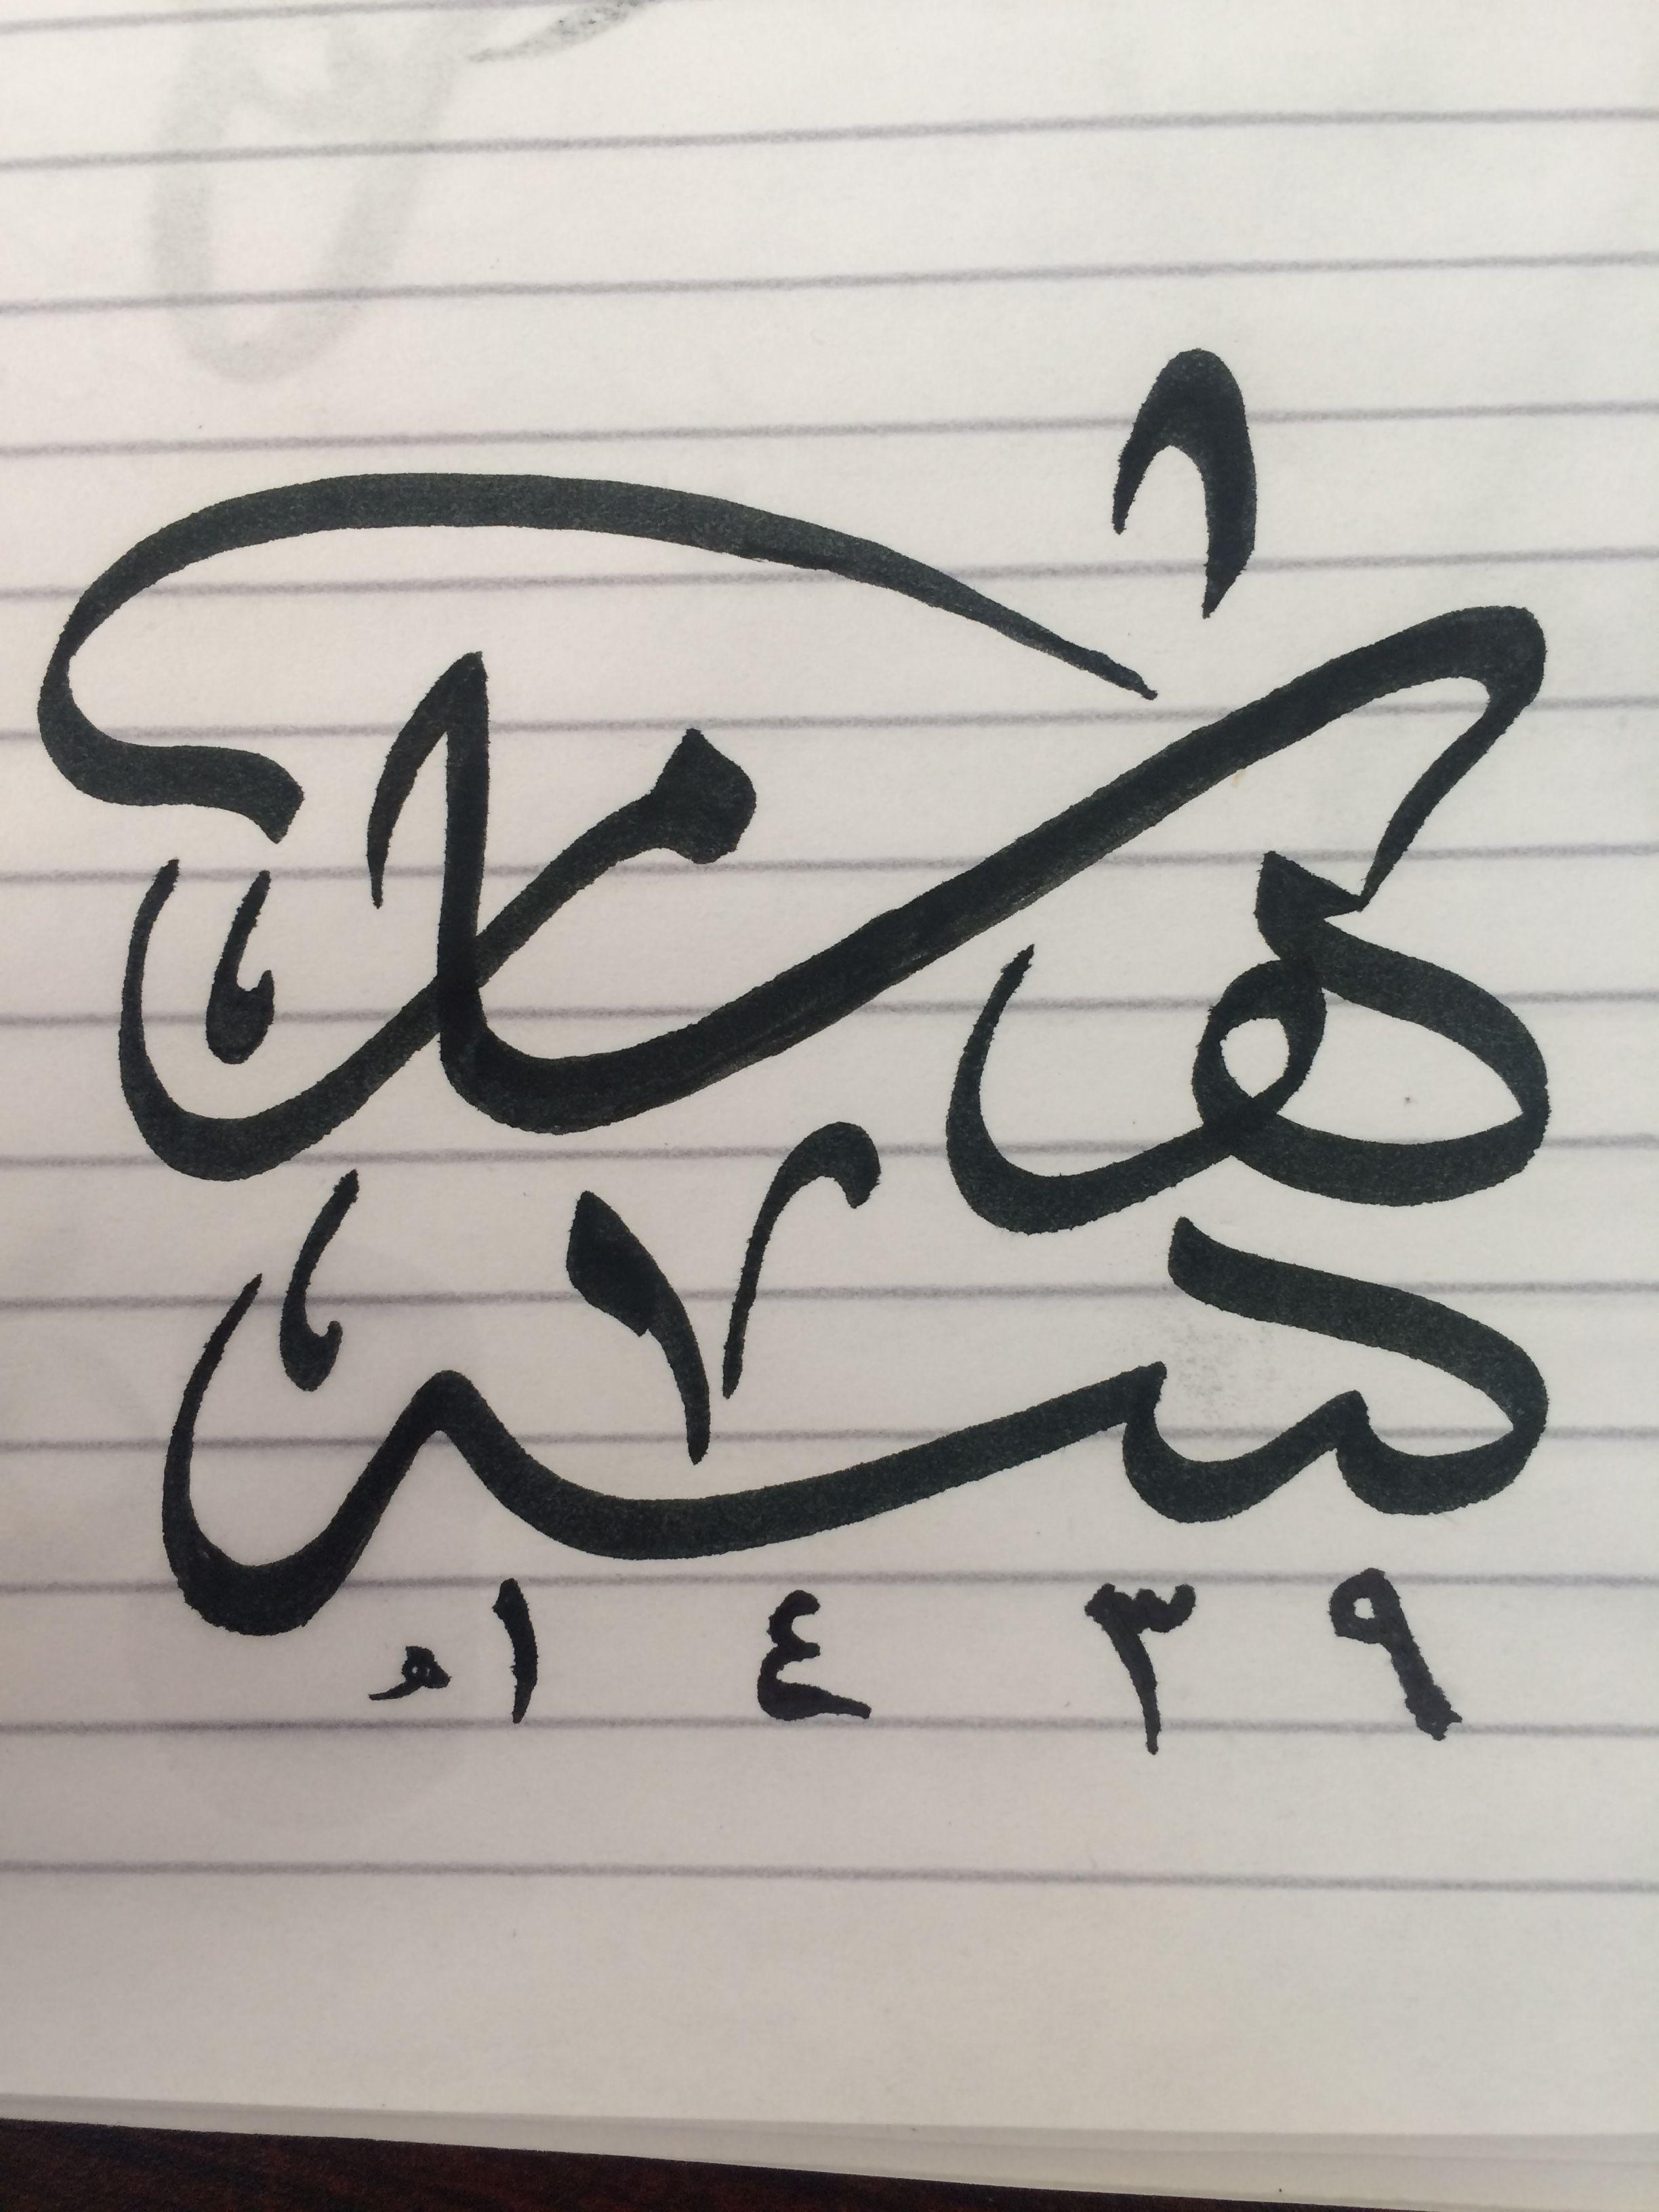 كتبه هشام Arabic Art Poetry Collection Art